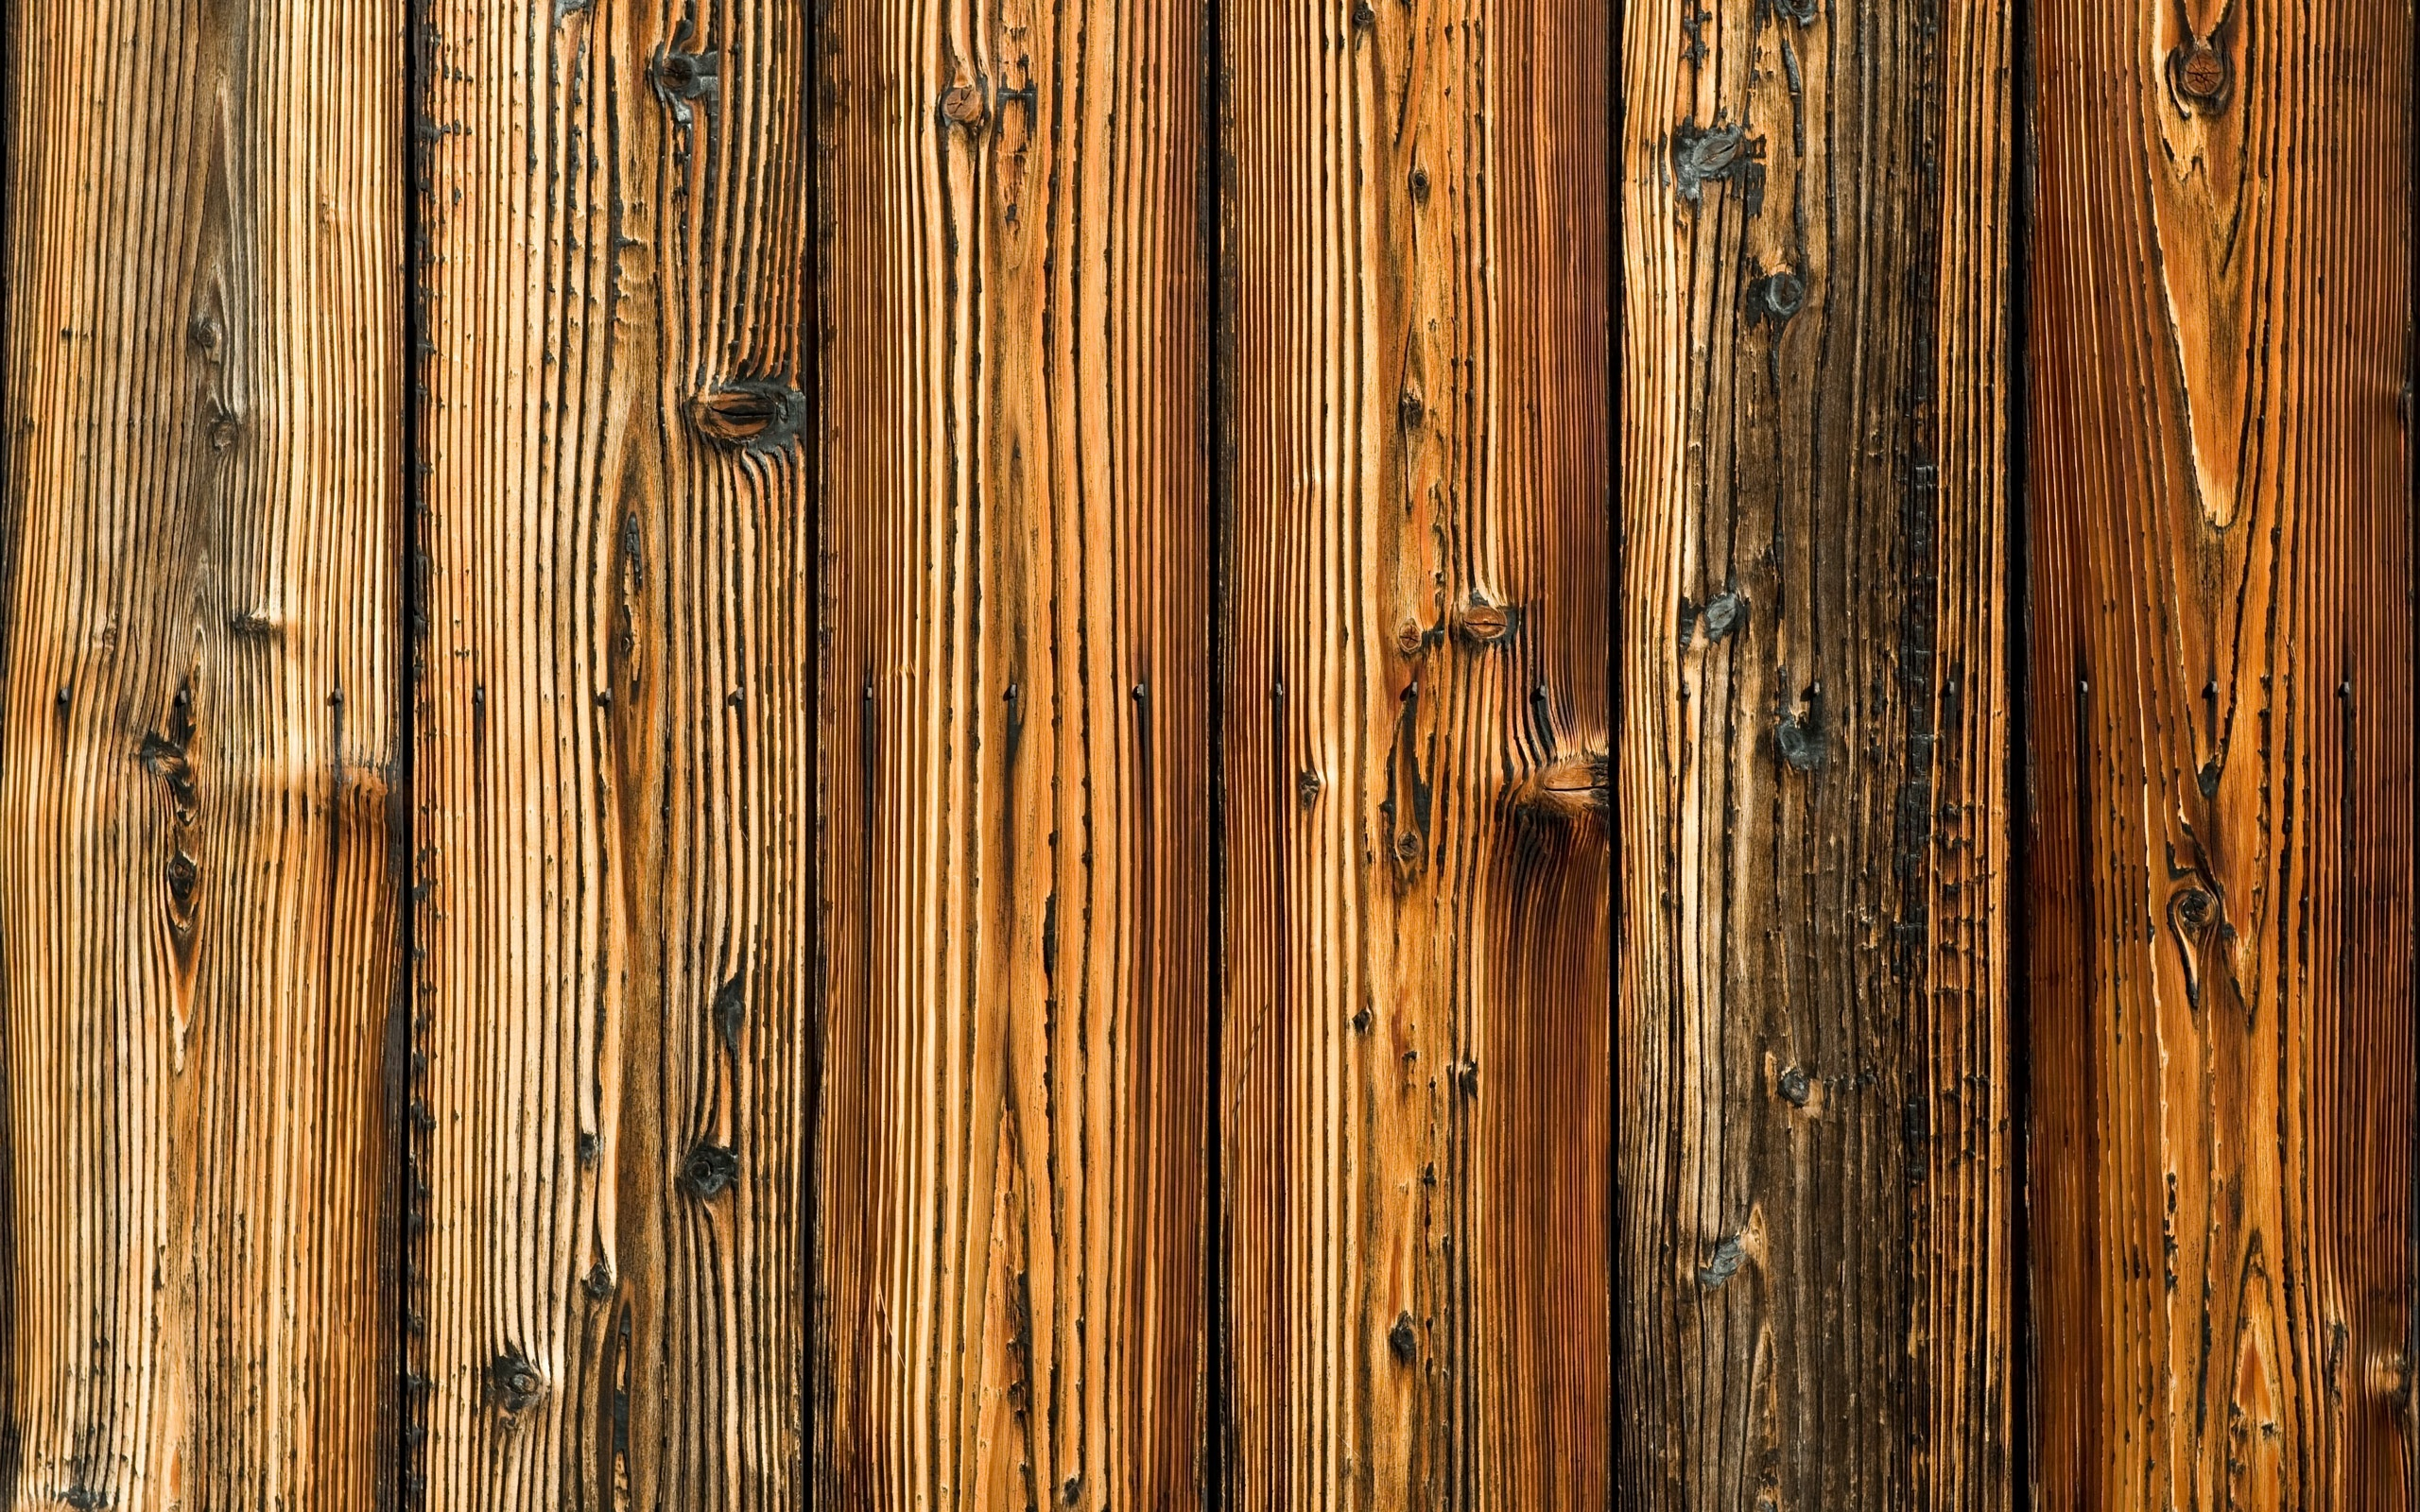 Wallpaper textures wood board desktop wallpaper Other GoodWP 2560x1600